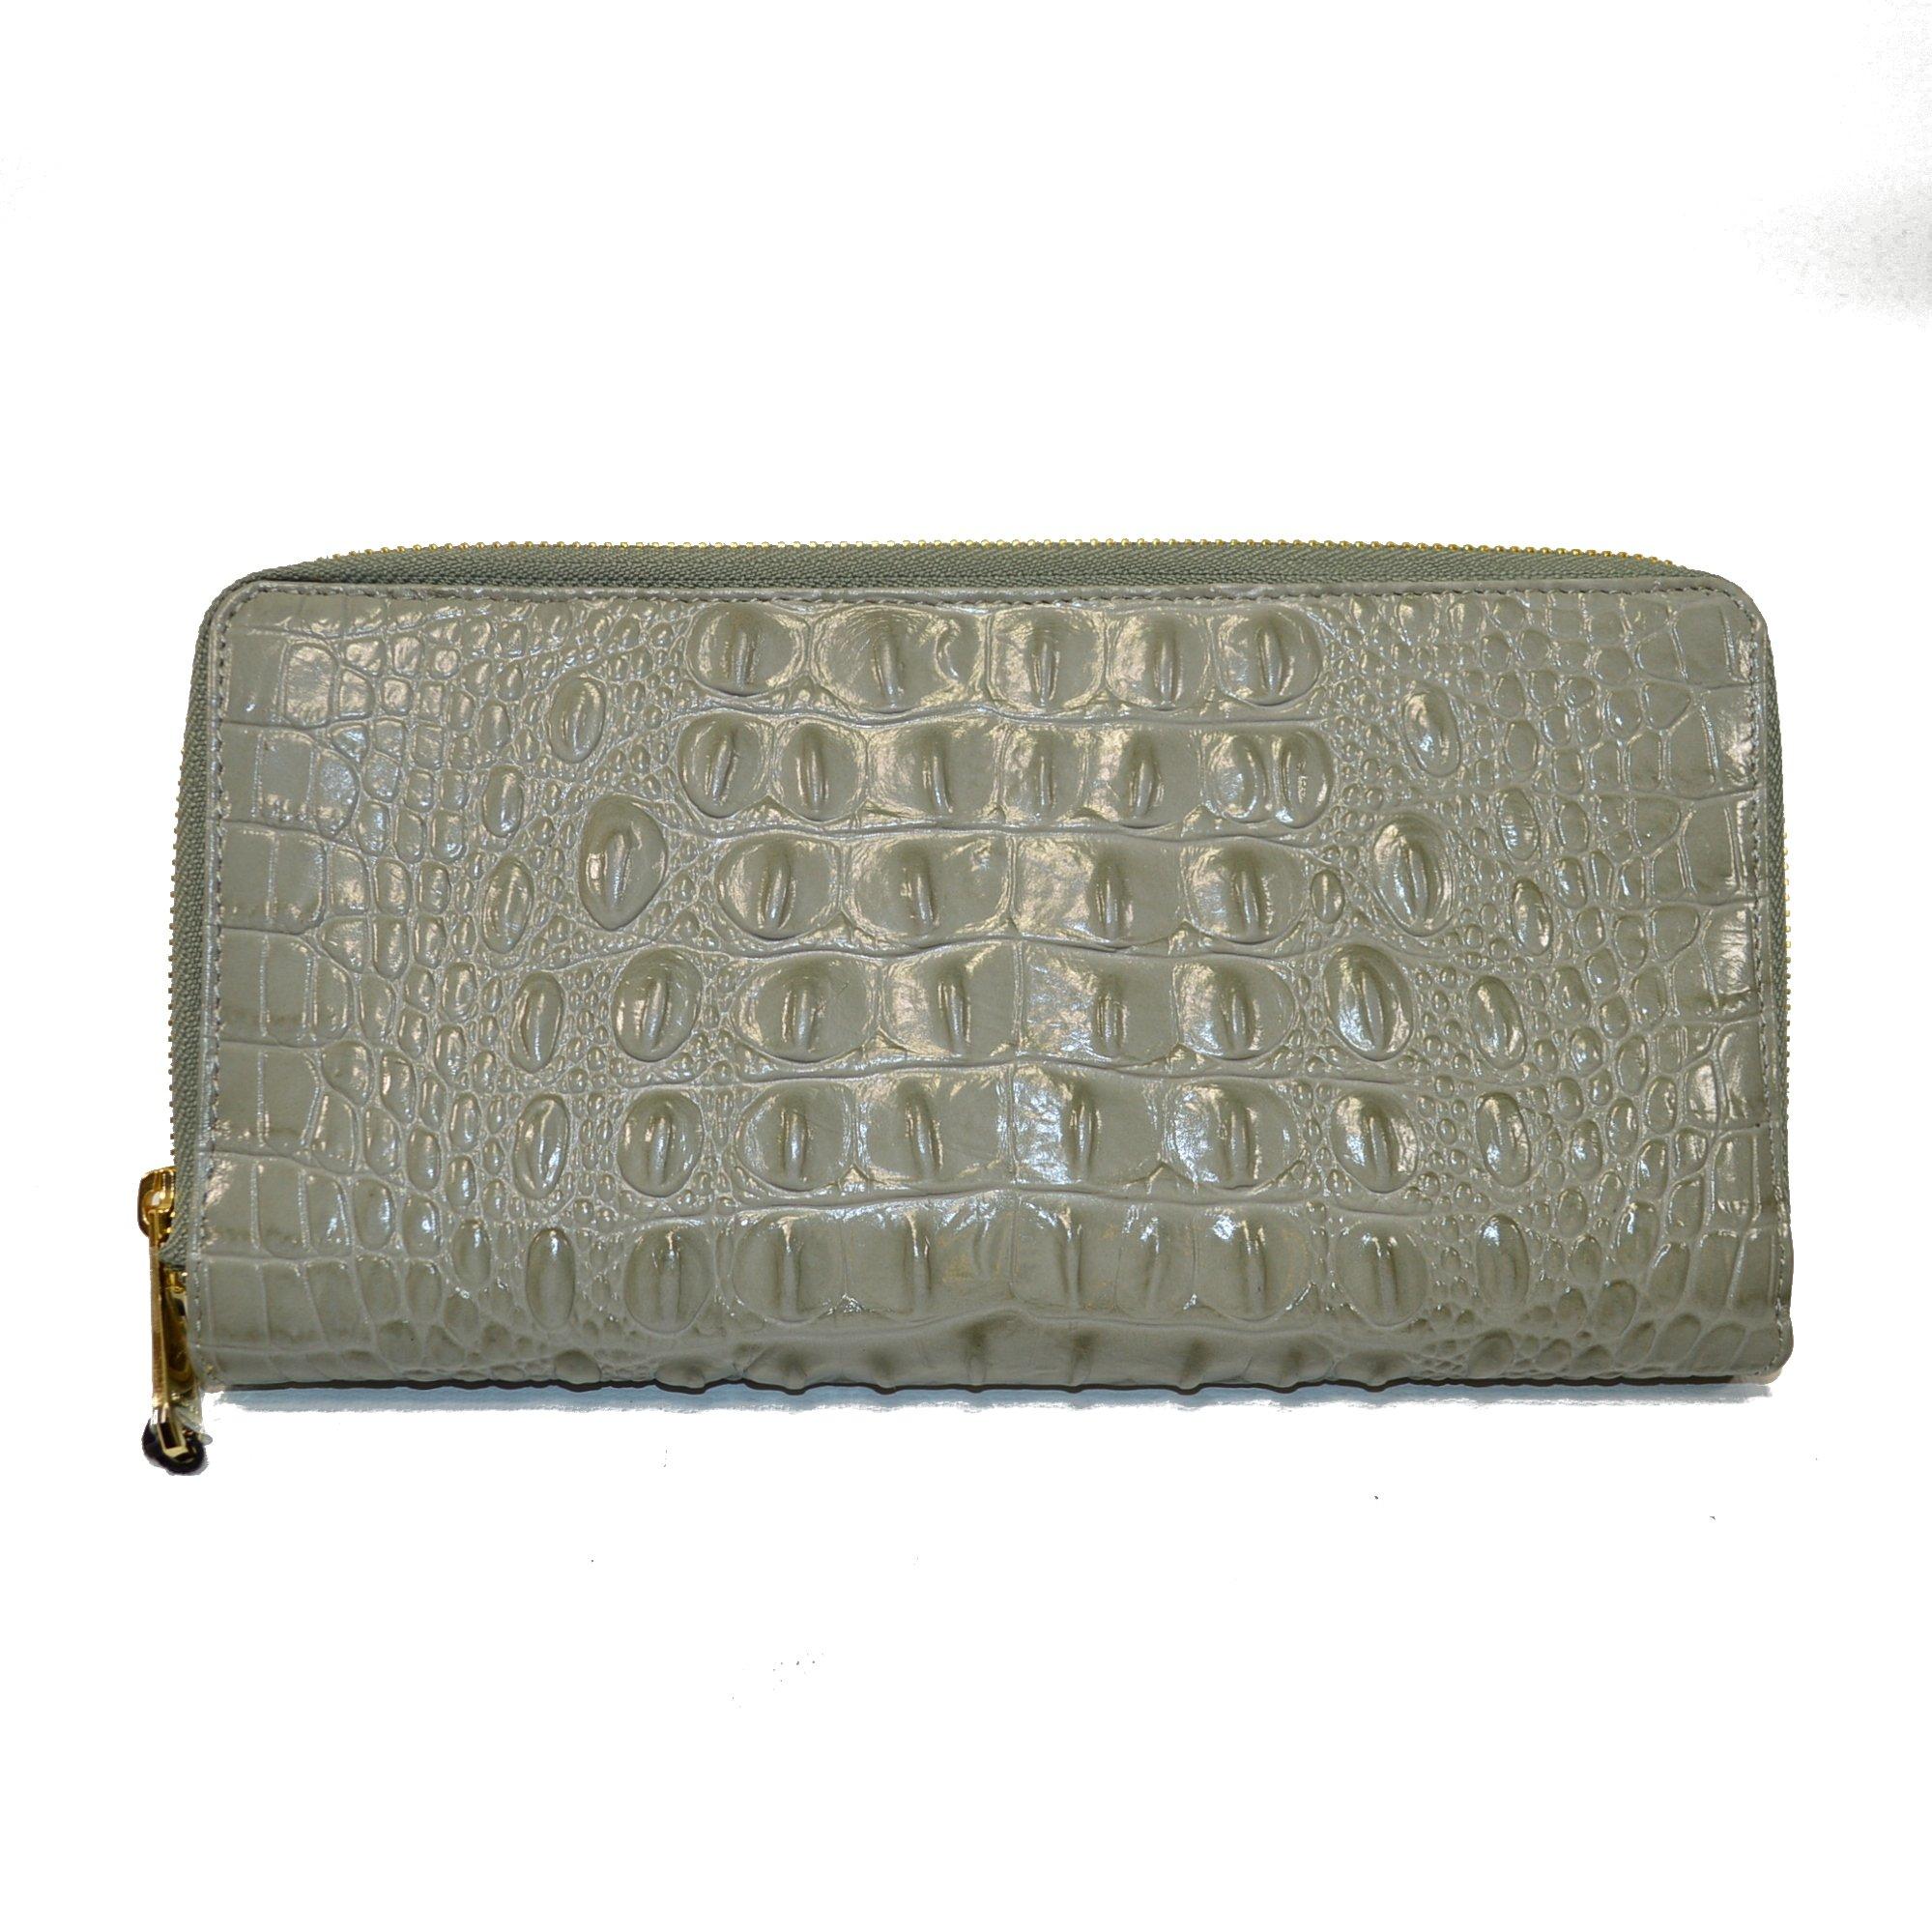 Brahmin Skyler Travel wallet Clutch Wristlet Silver Sage Melbourne by Brahmin